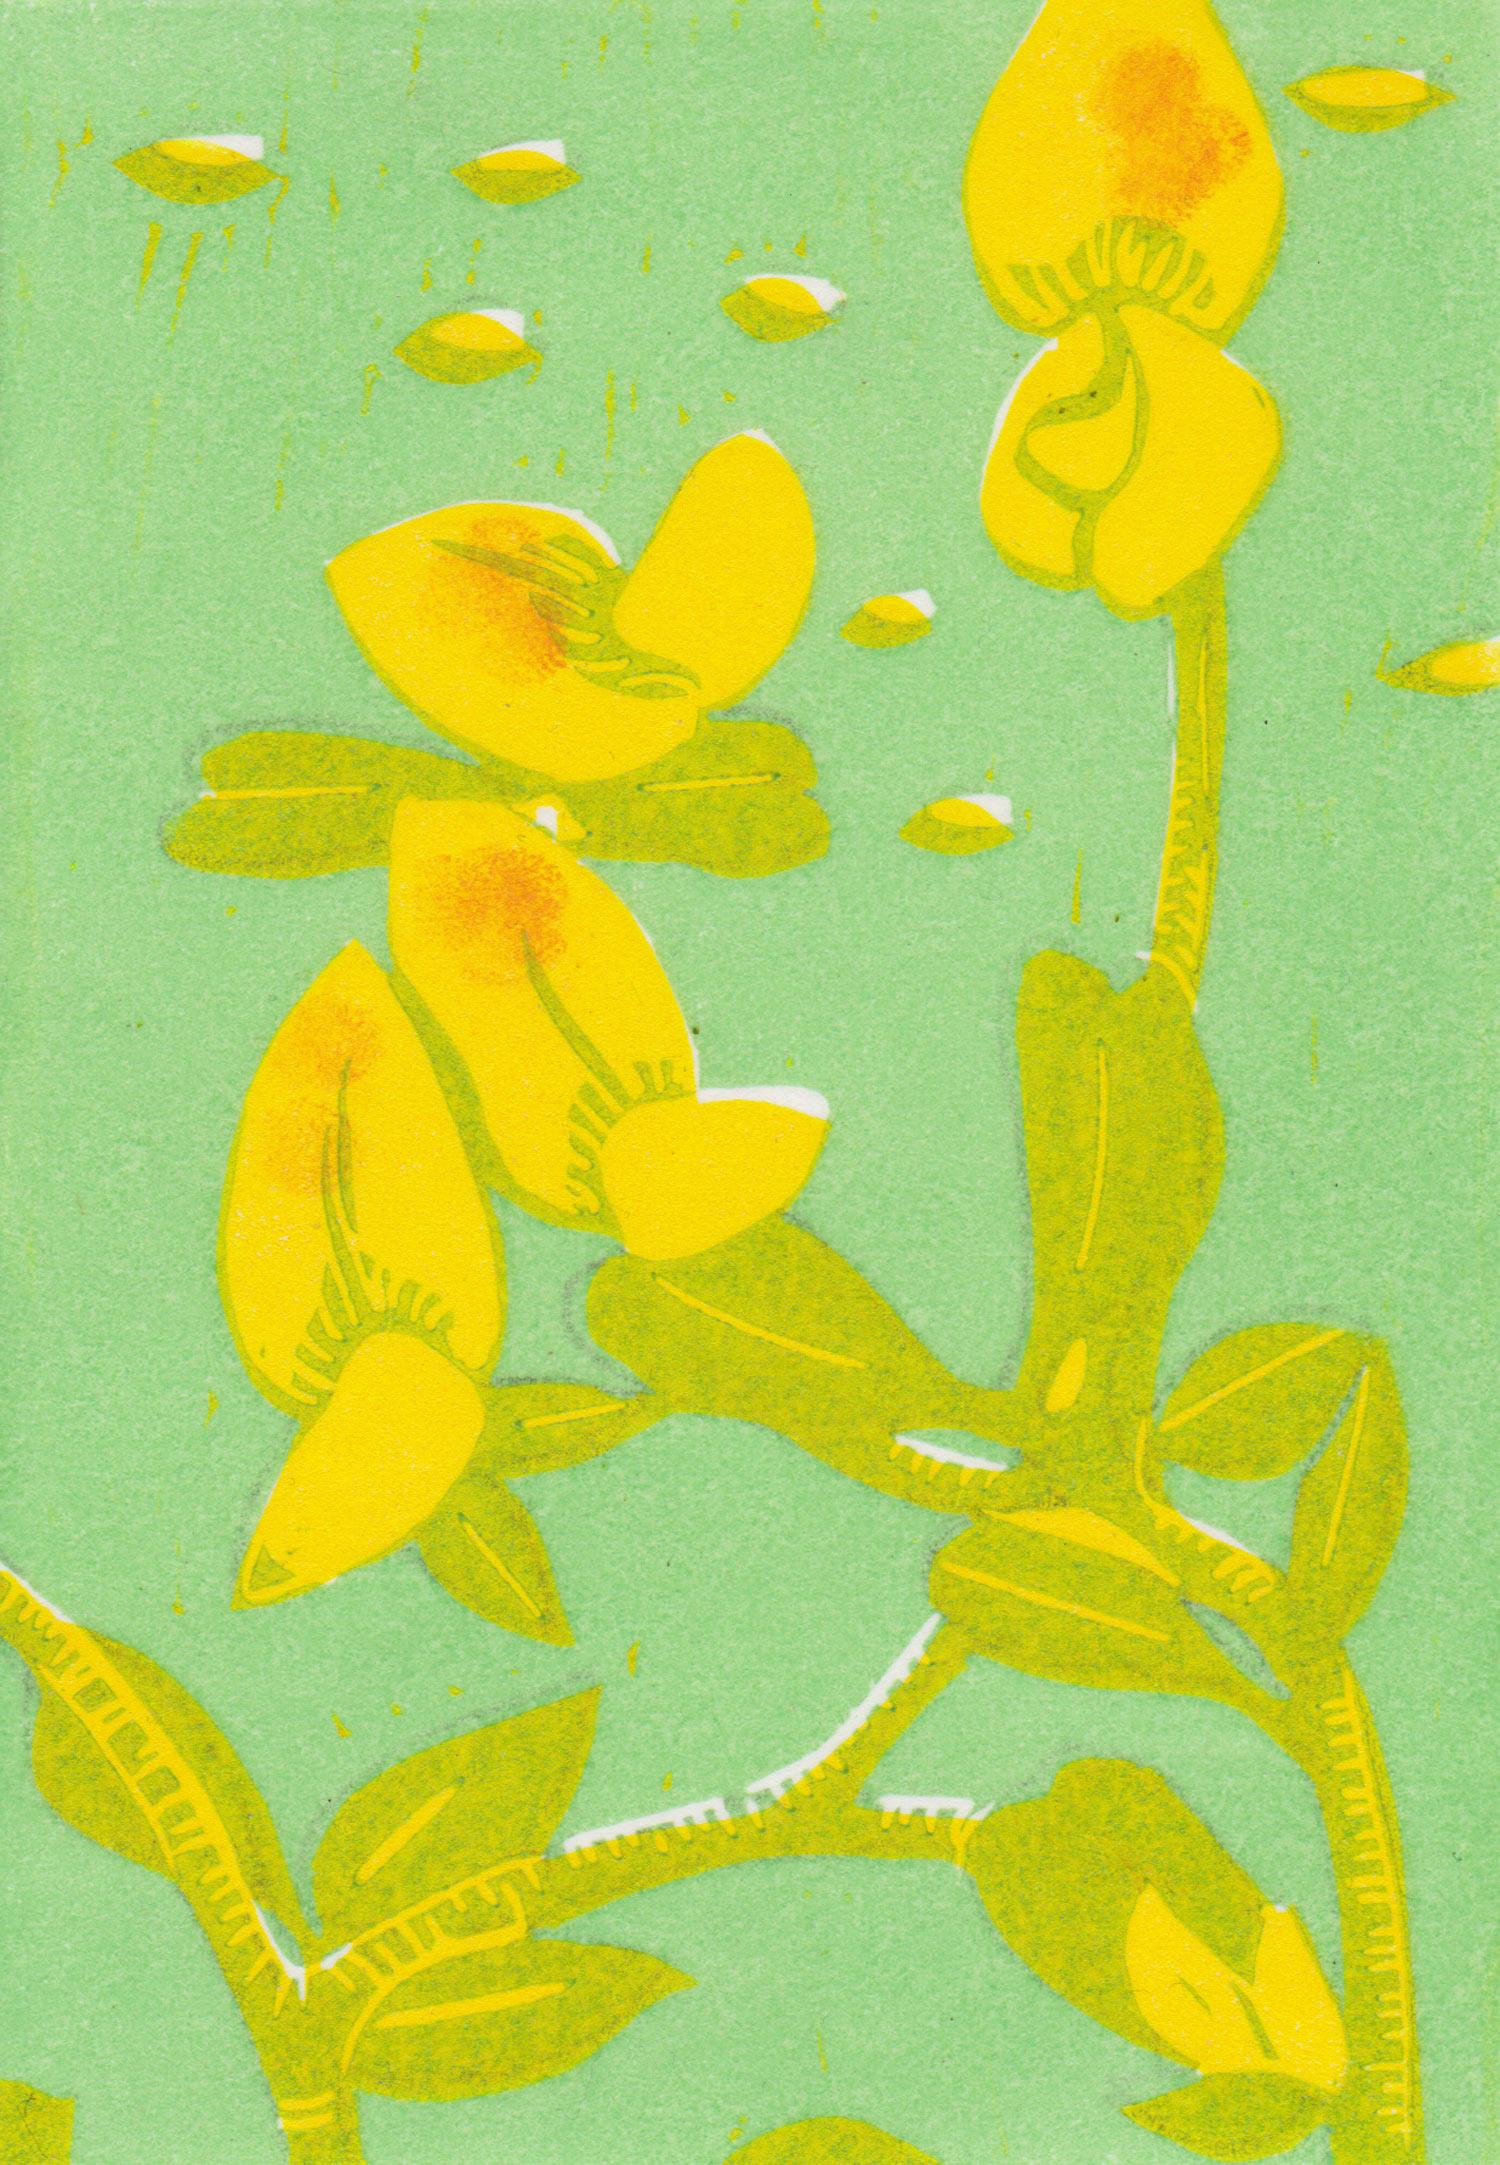 birdsfoot-trefoil-linocut-print.jpg